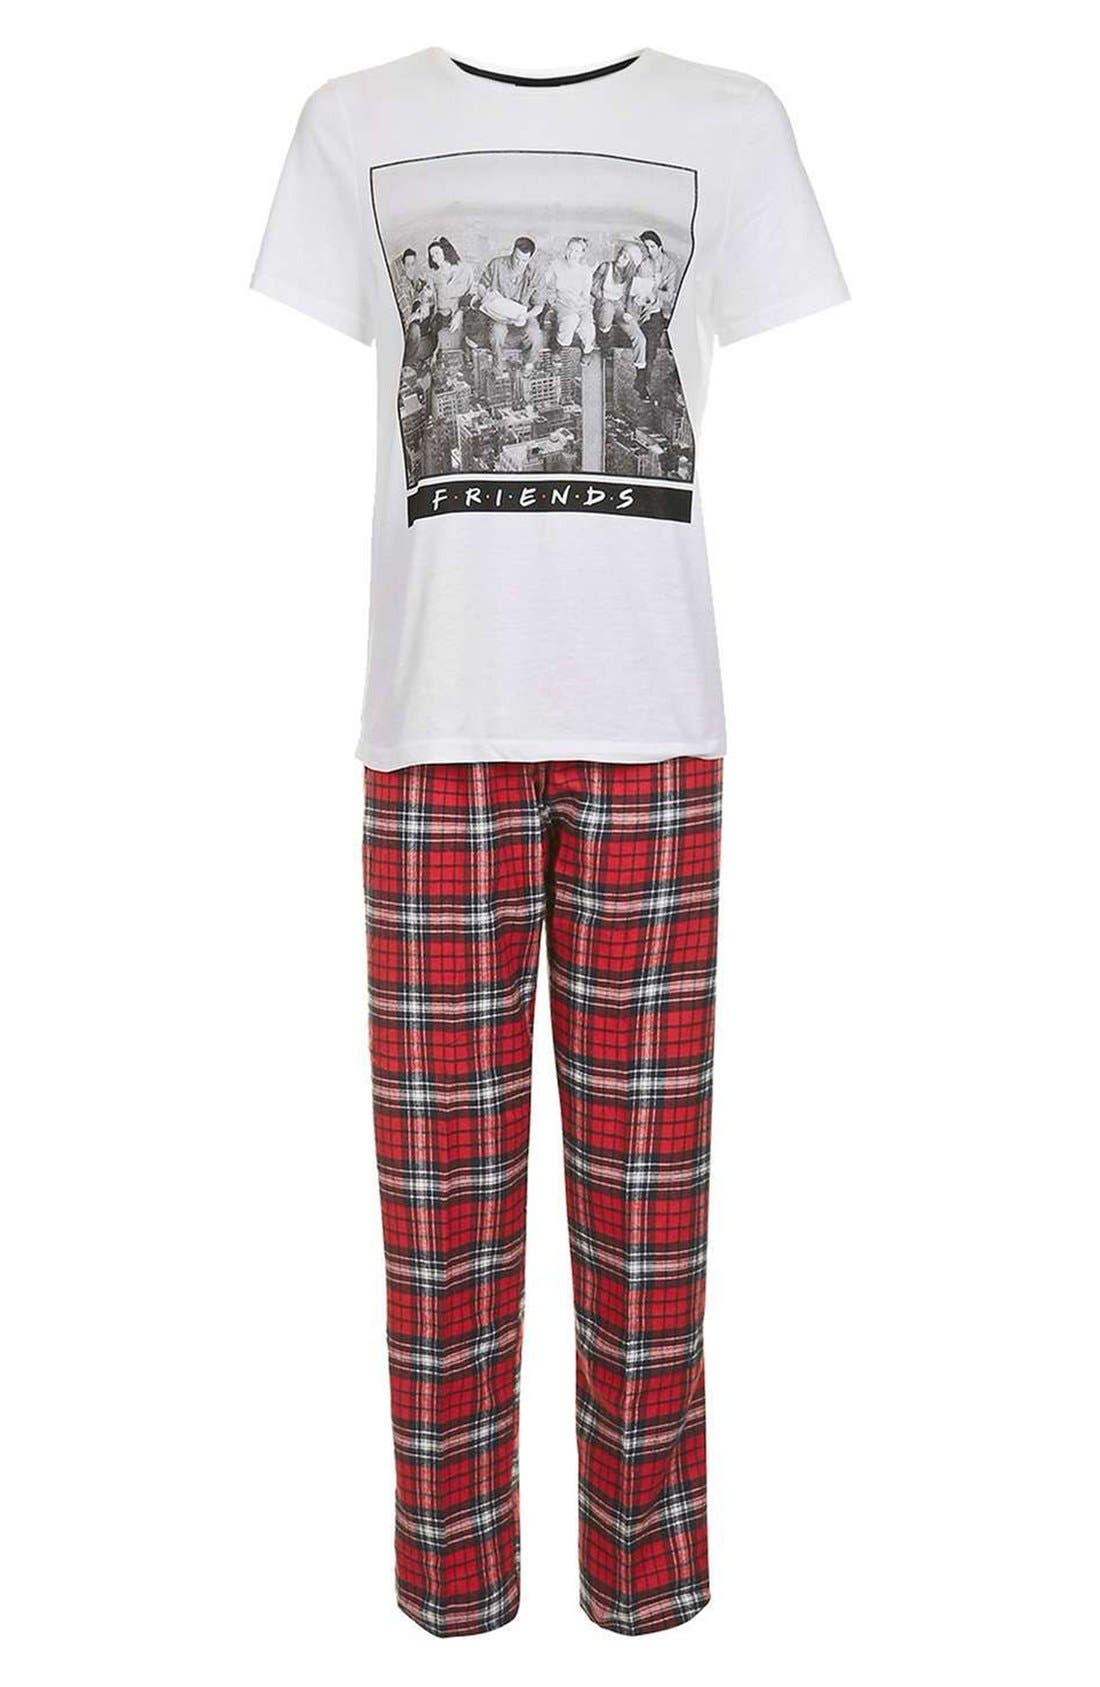 Friends Pajamas,                             Alternate thumbnail 4, color,                             100